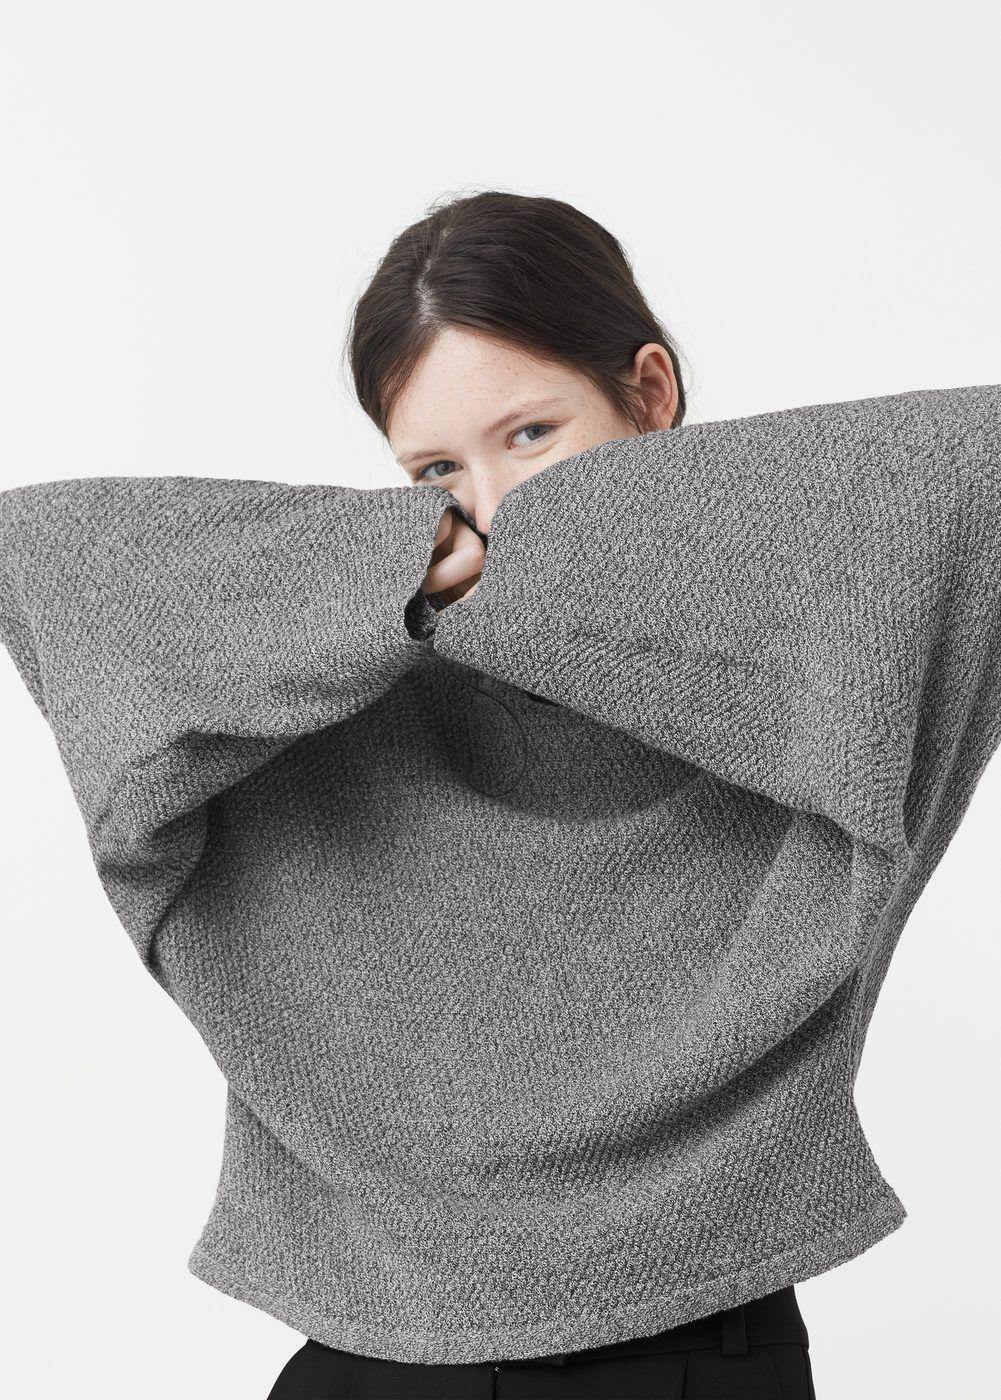 newest collection 3111a 9b4c8 Oversize-pullover - Damen | Stricken | Oversize pullover ...